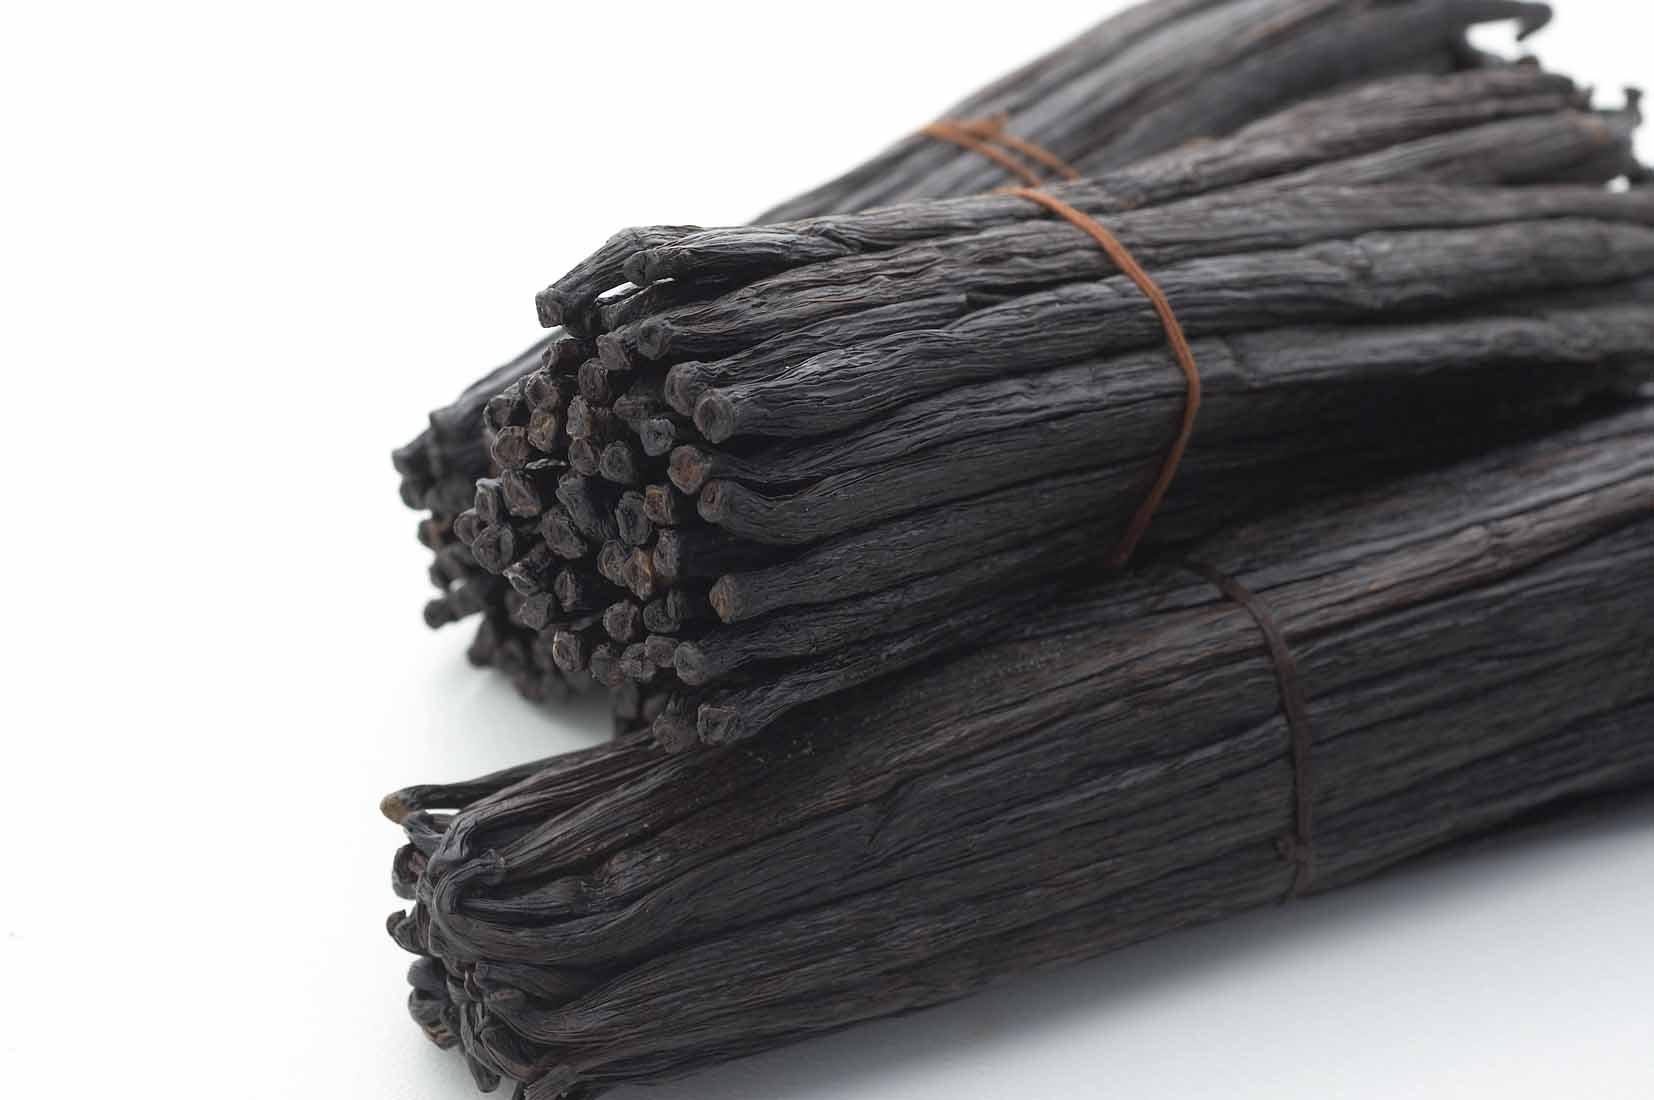 Madagascar Vanilla Beans. Whole Grade A Vanilla Pods for Vanilla Extract and Baking (10 Beans) by Vanilla Bean Kings (Image #6)